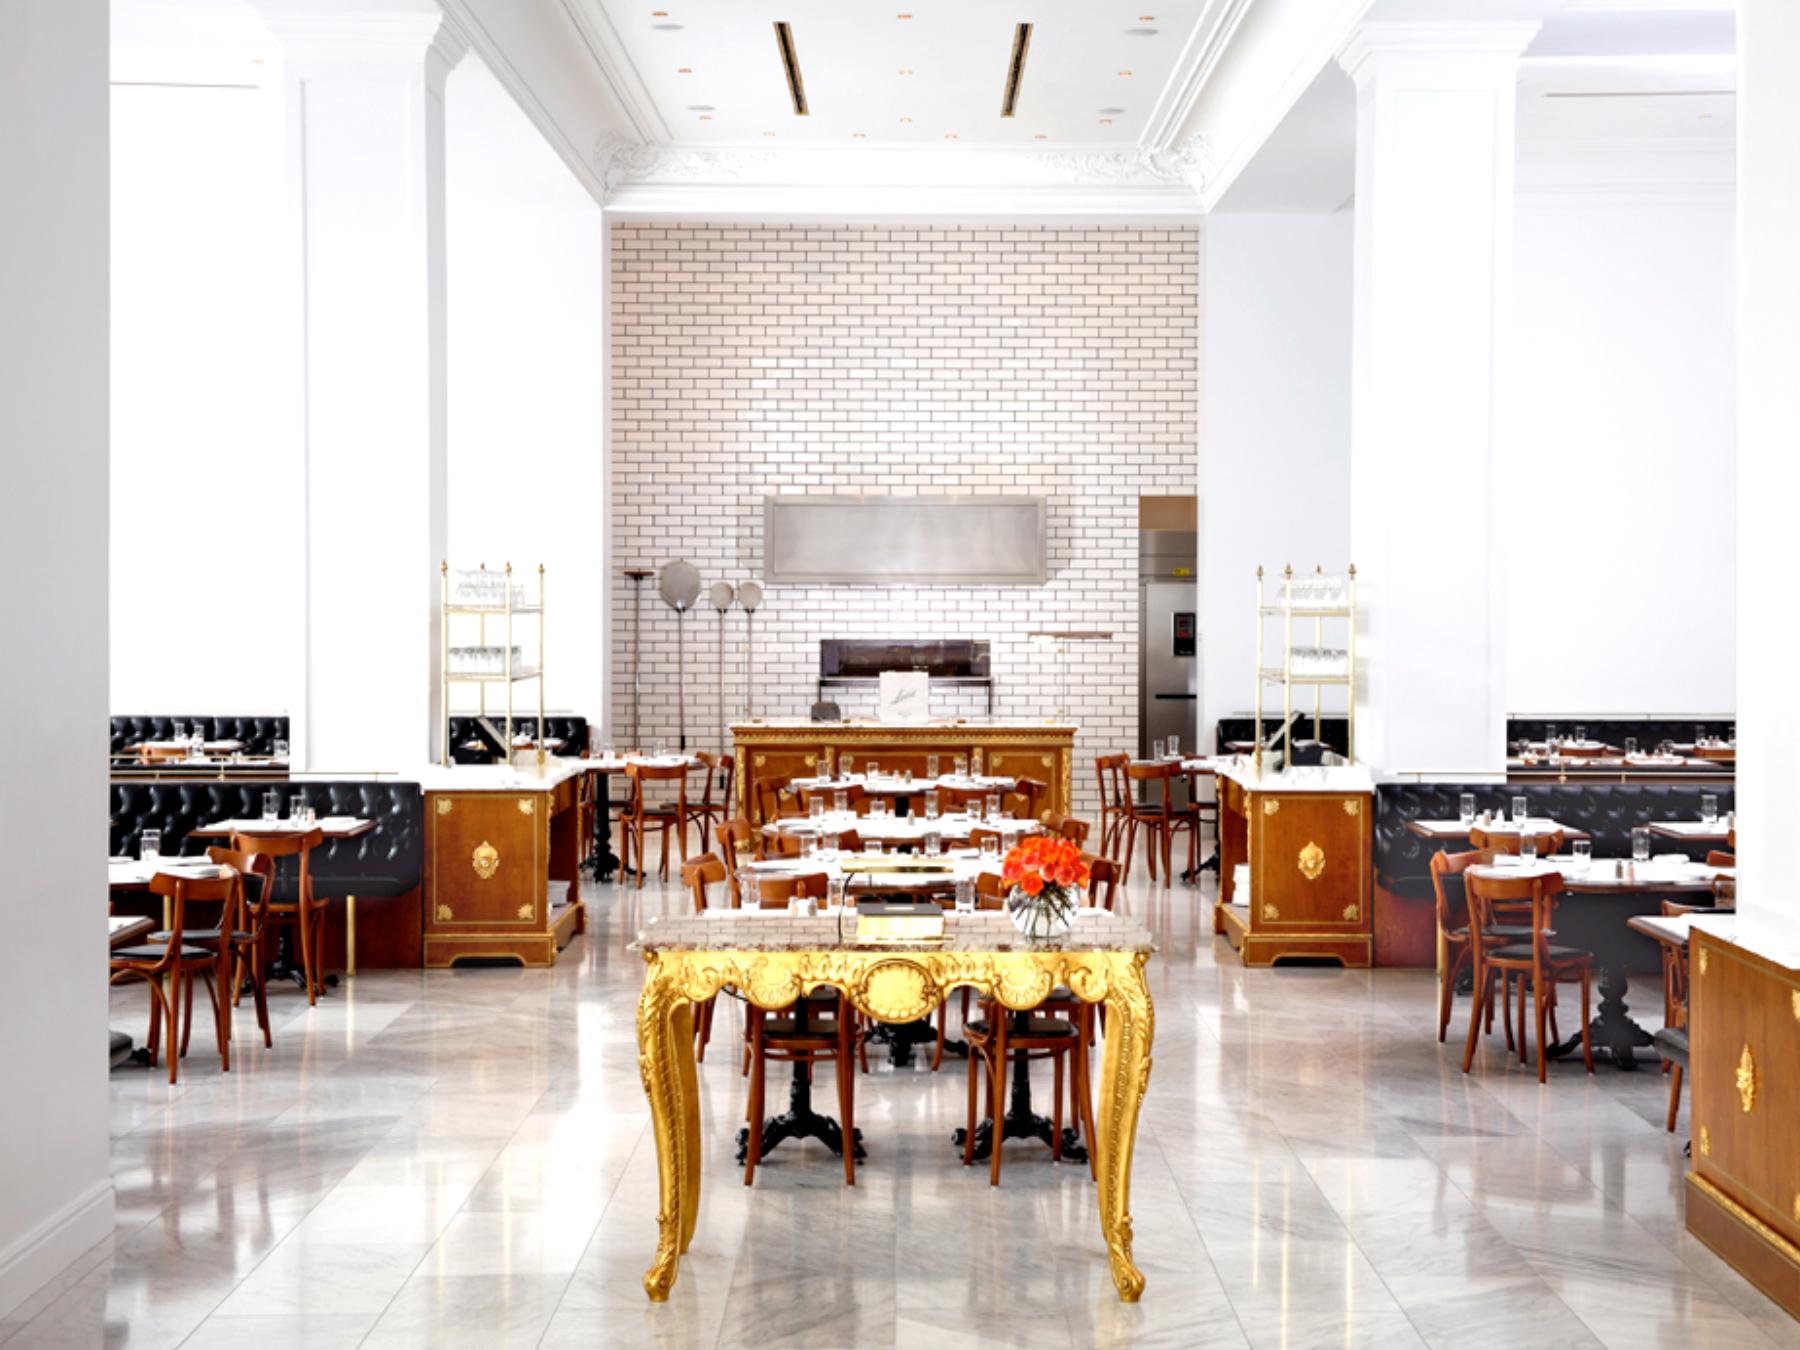 Bottega Louie's marble and gold restaurant interior.